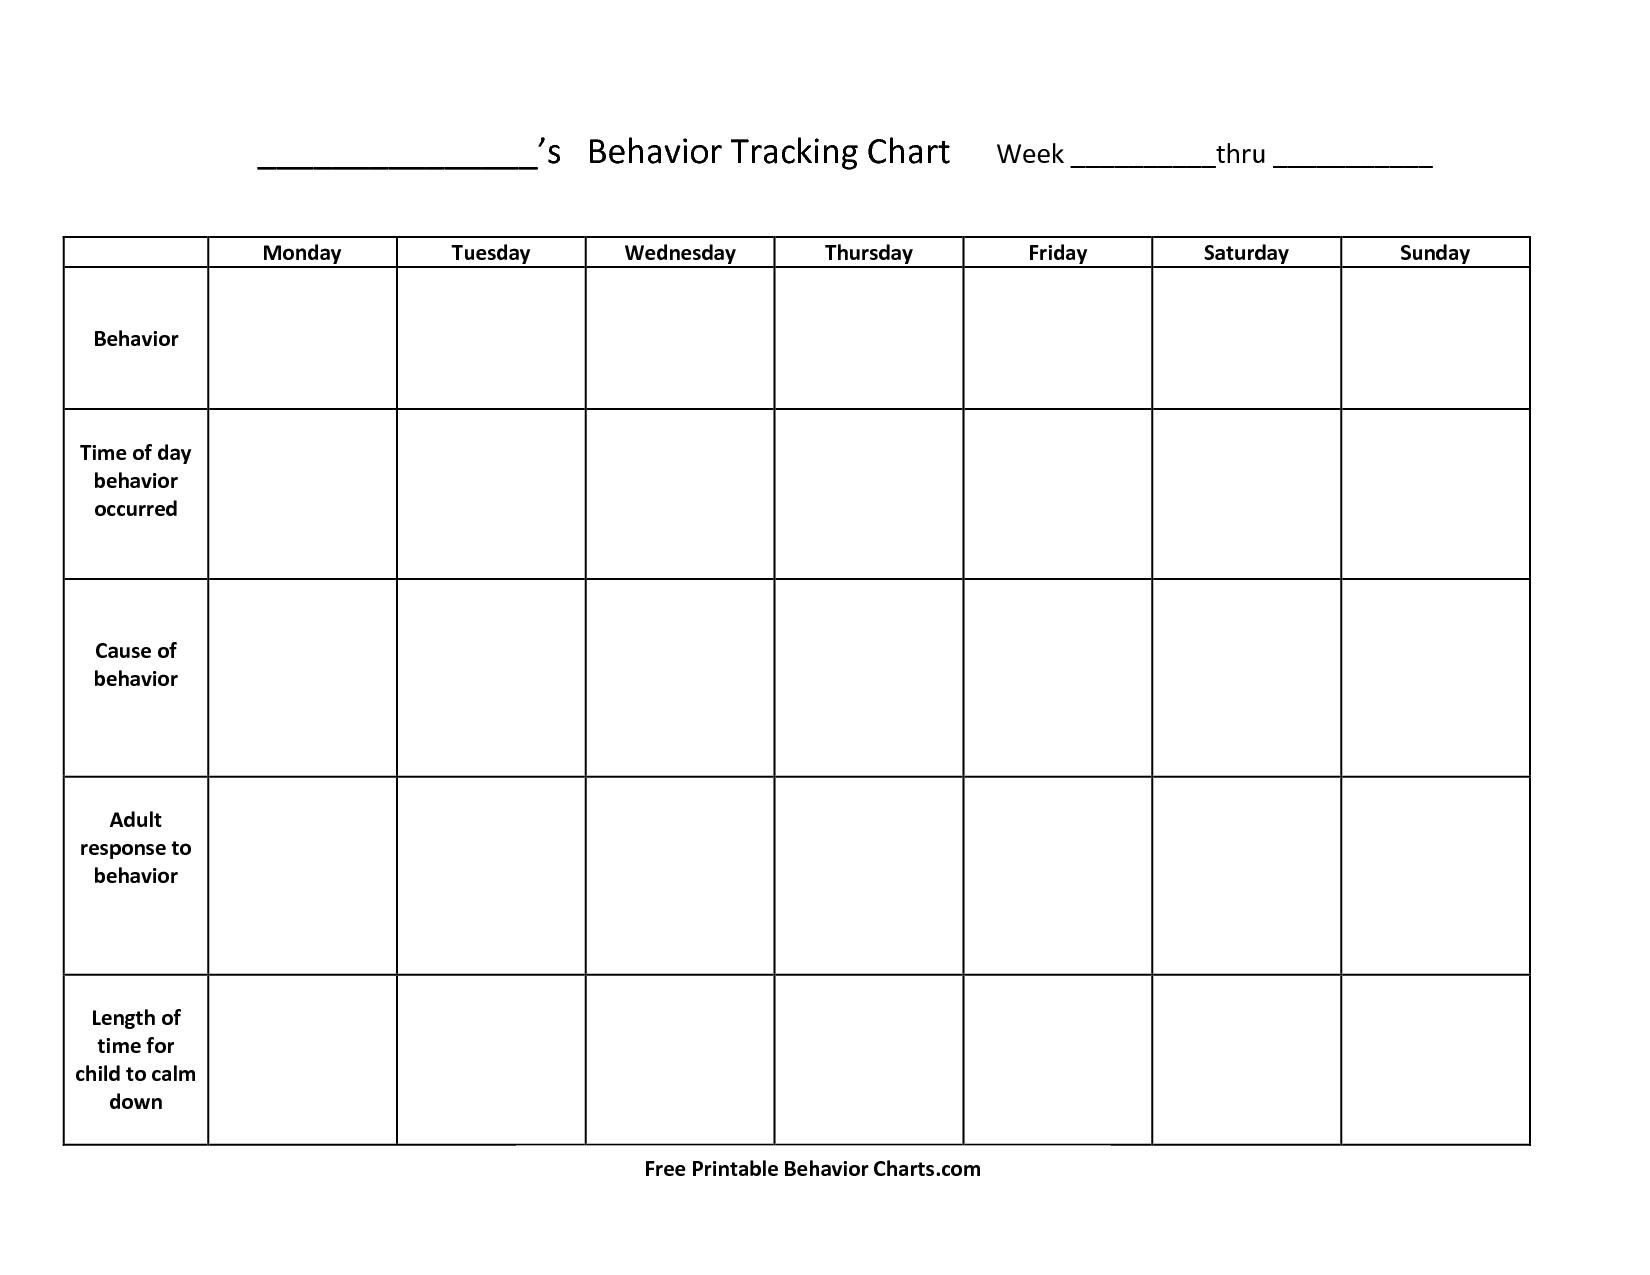 Free+Printable+Behavior+Charts+For+Teachers   Things To Try   Free - Free Printable Charts For Classroom